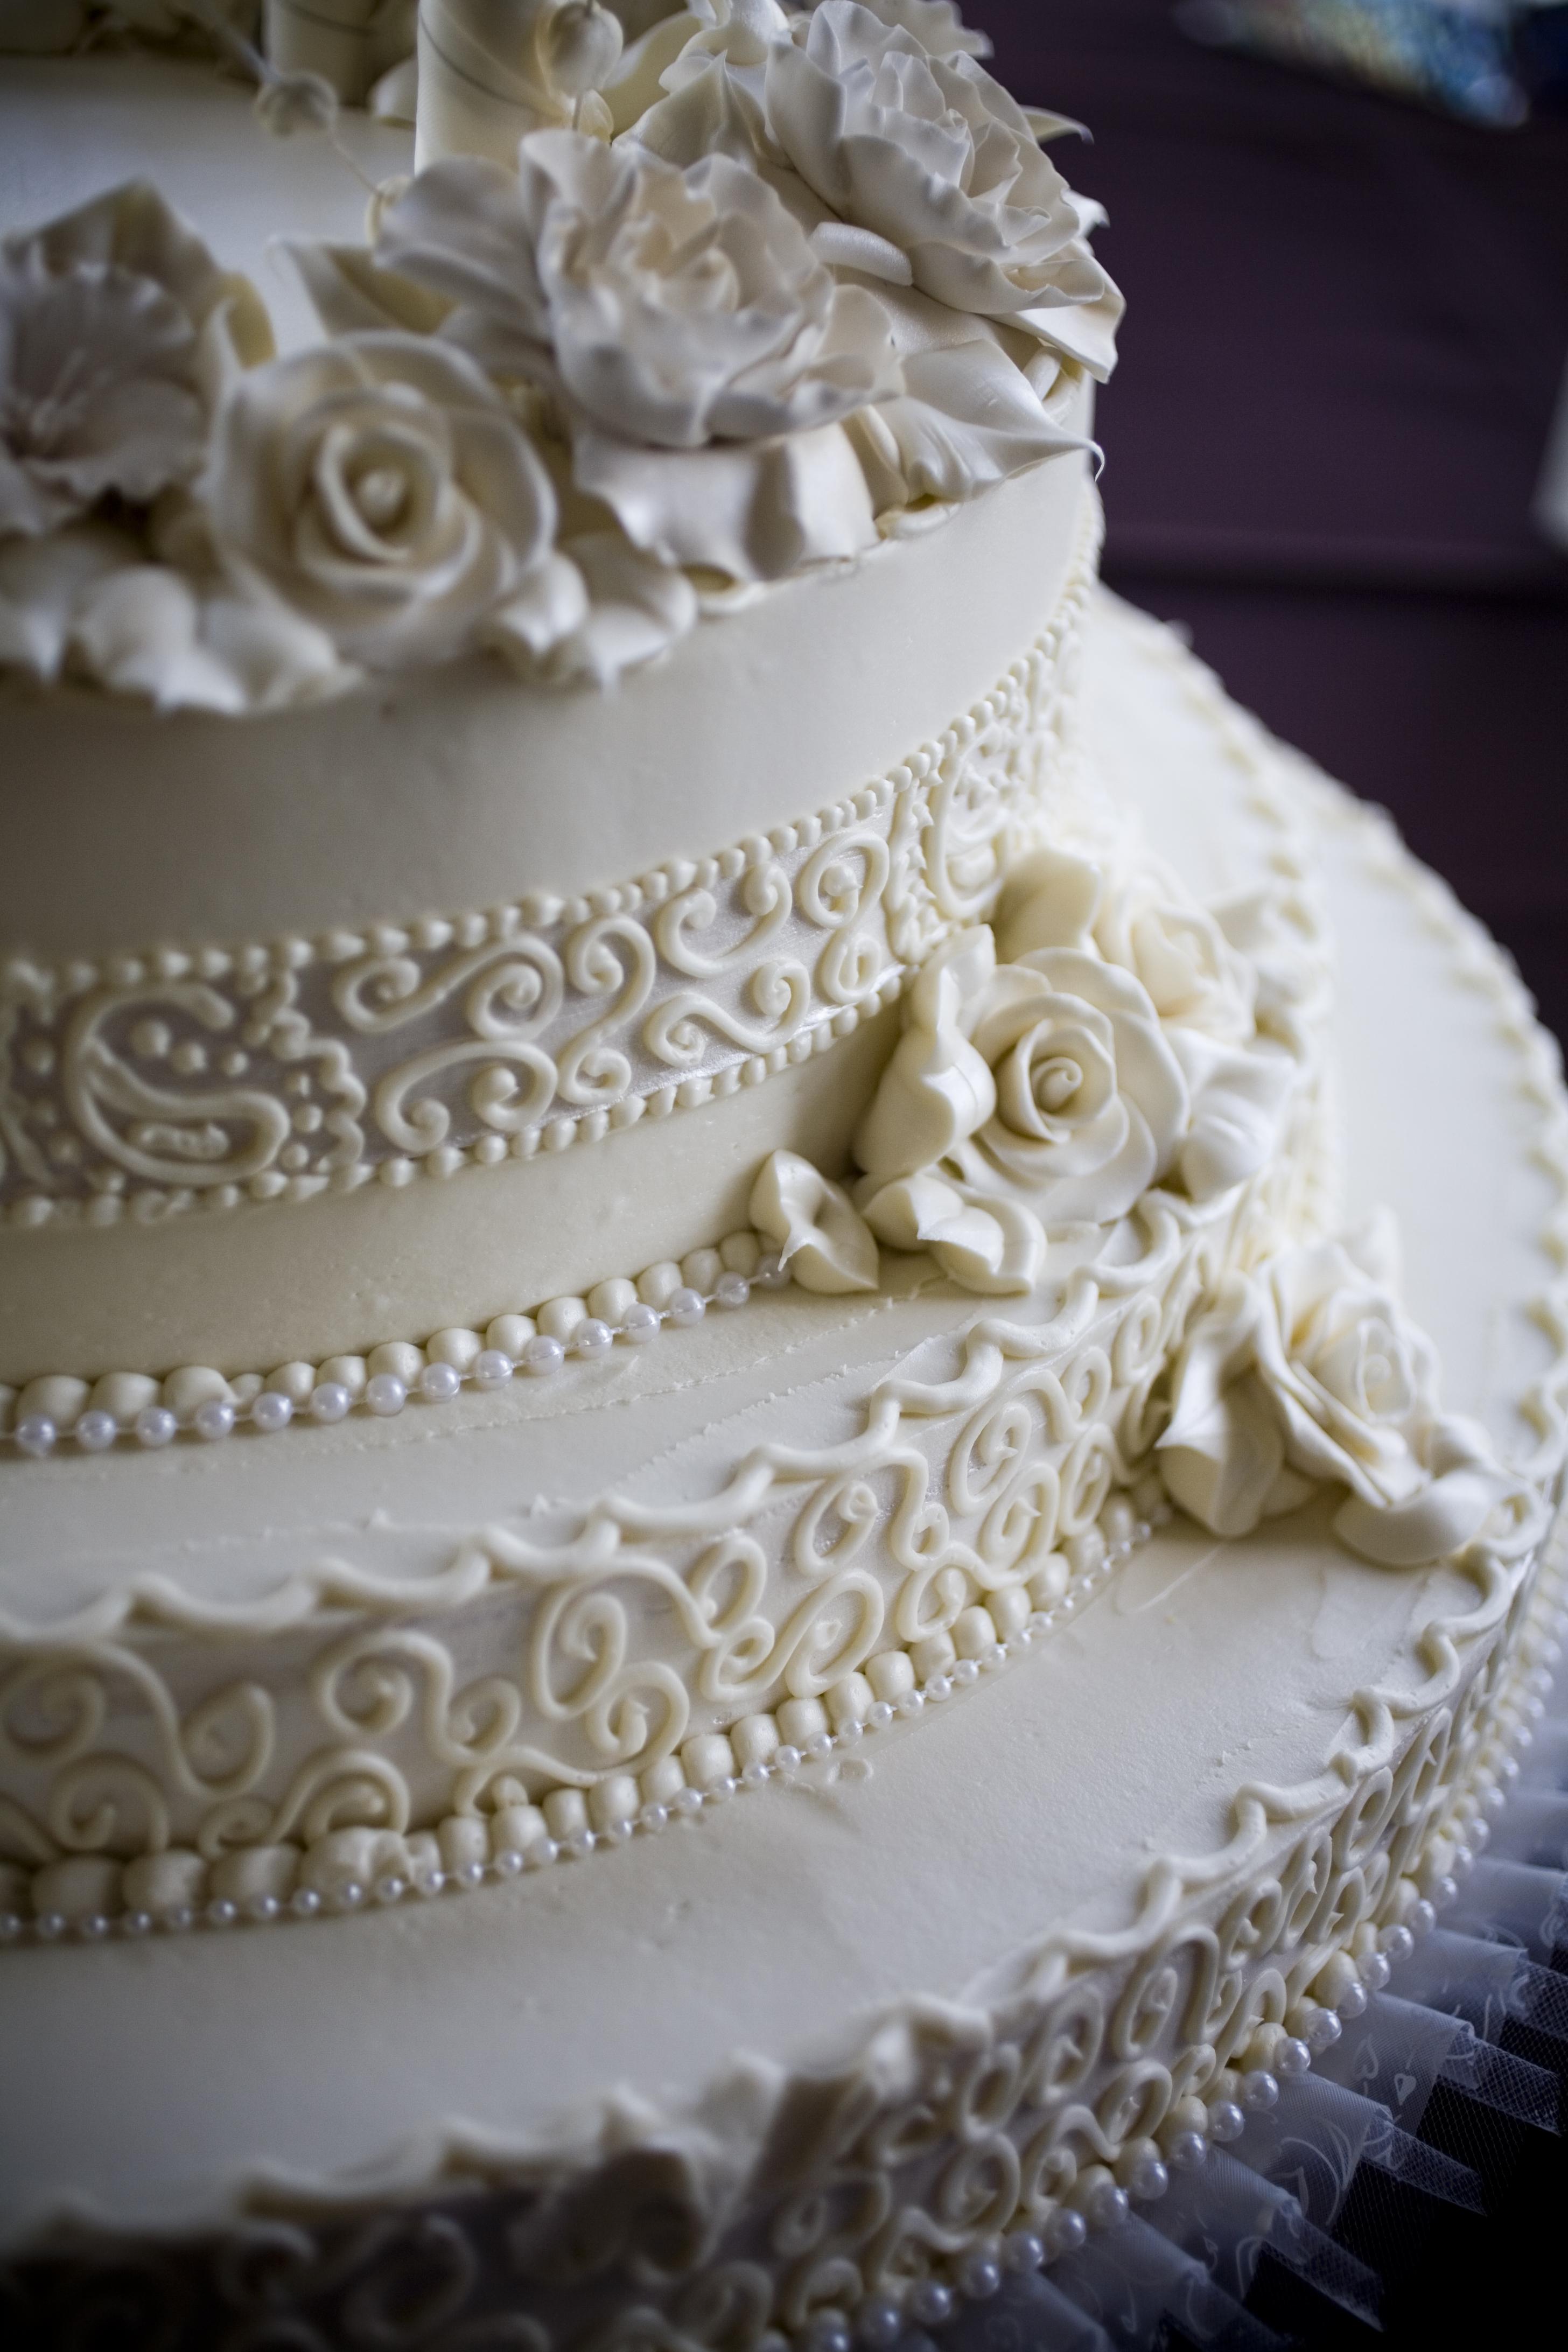 1. cake